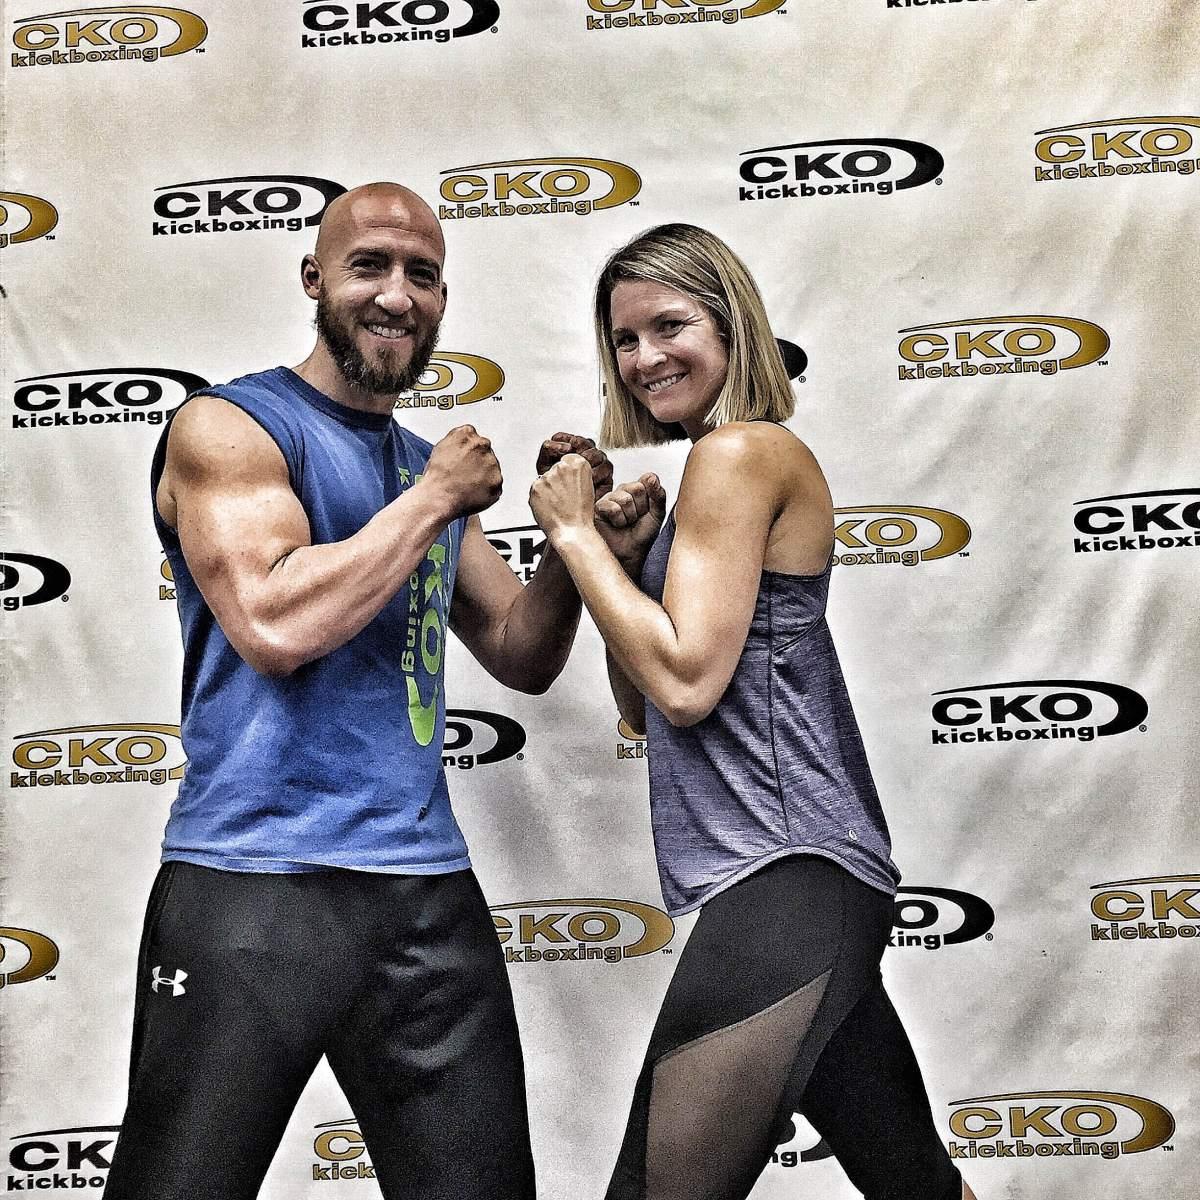 Garett Renon and Nikki Vaughan at CKO Kickboxing team renon podcast